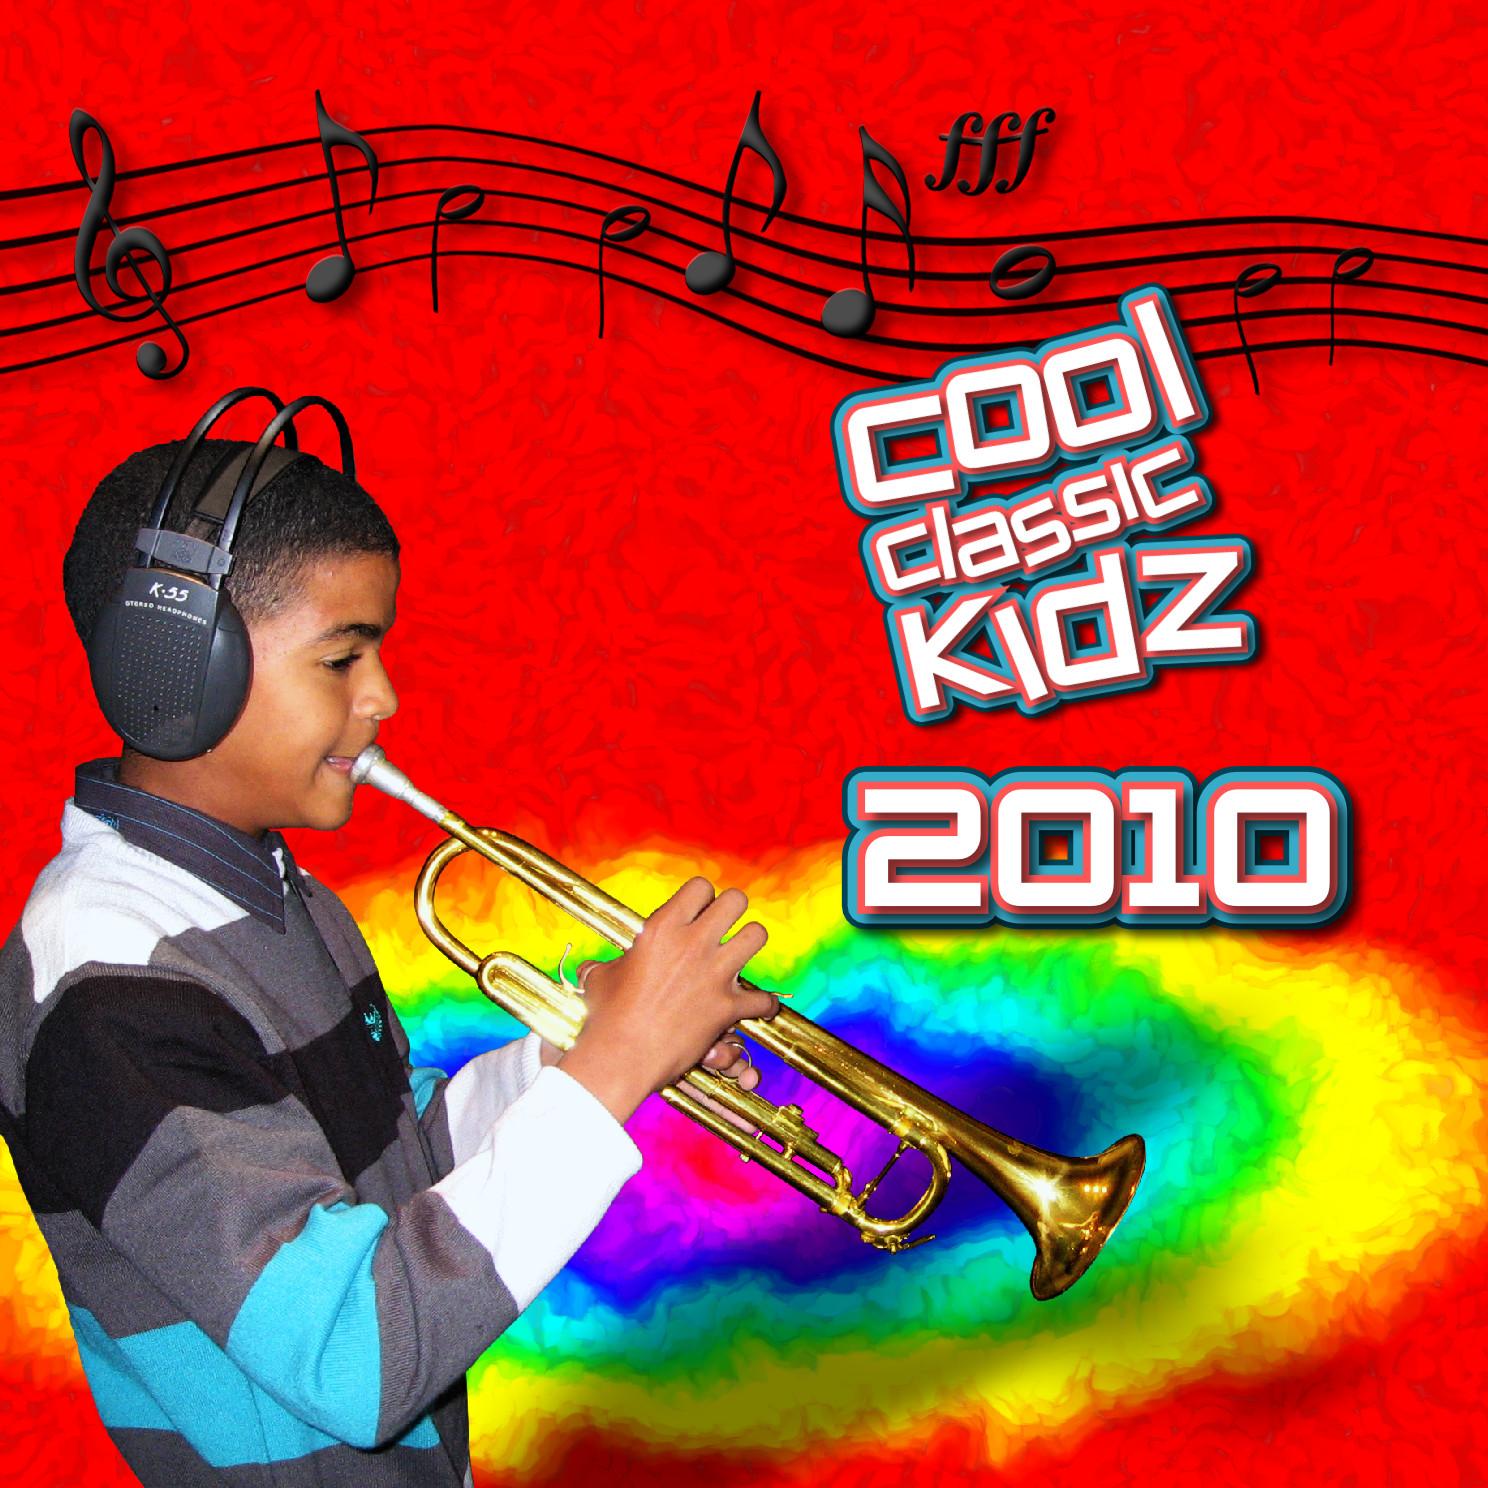 Kidz Index